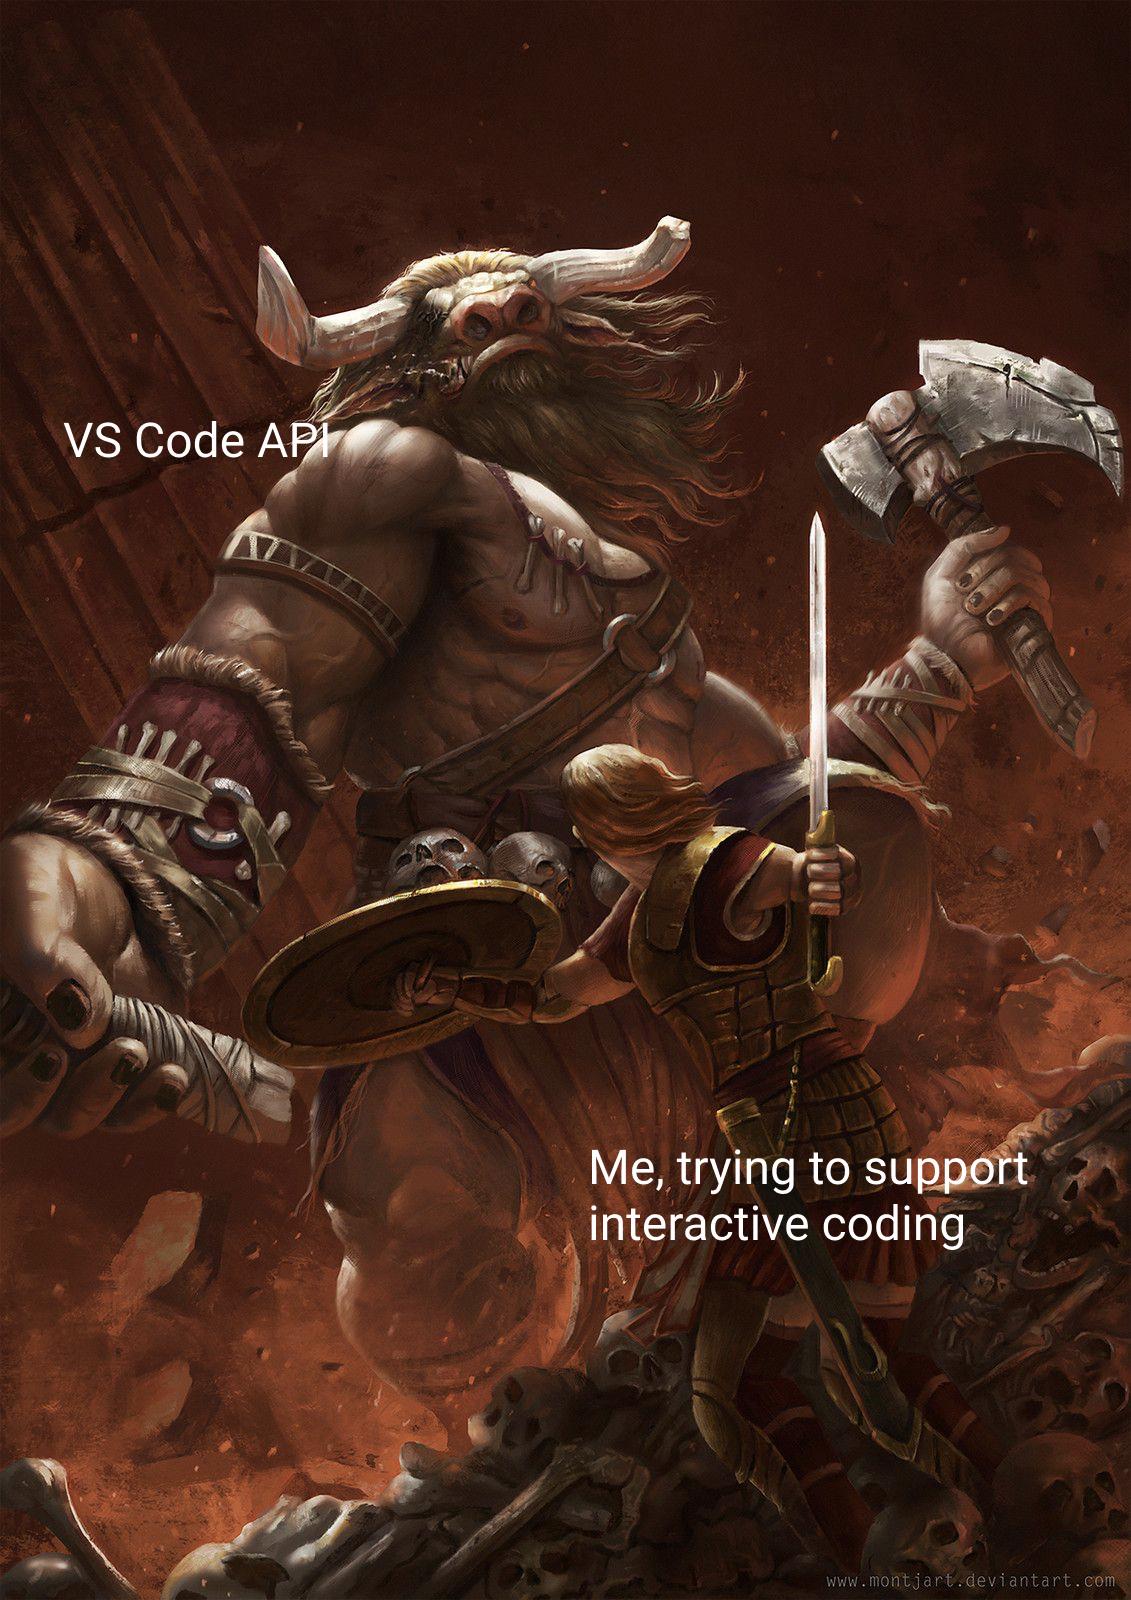 theseus vs code api